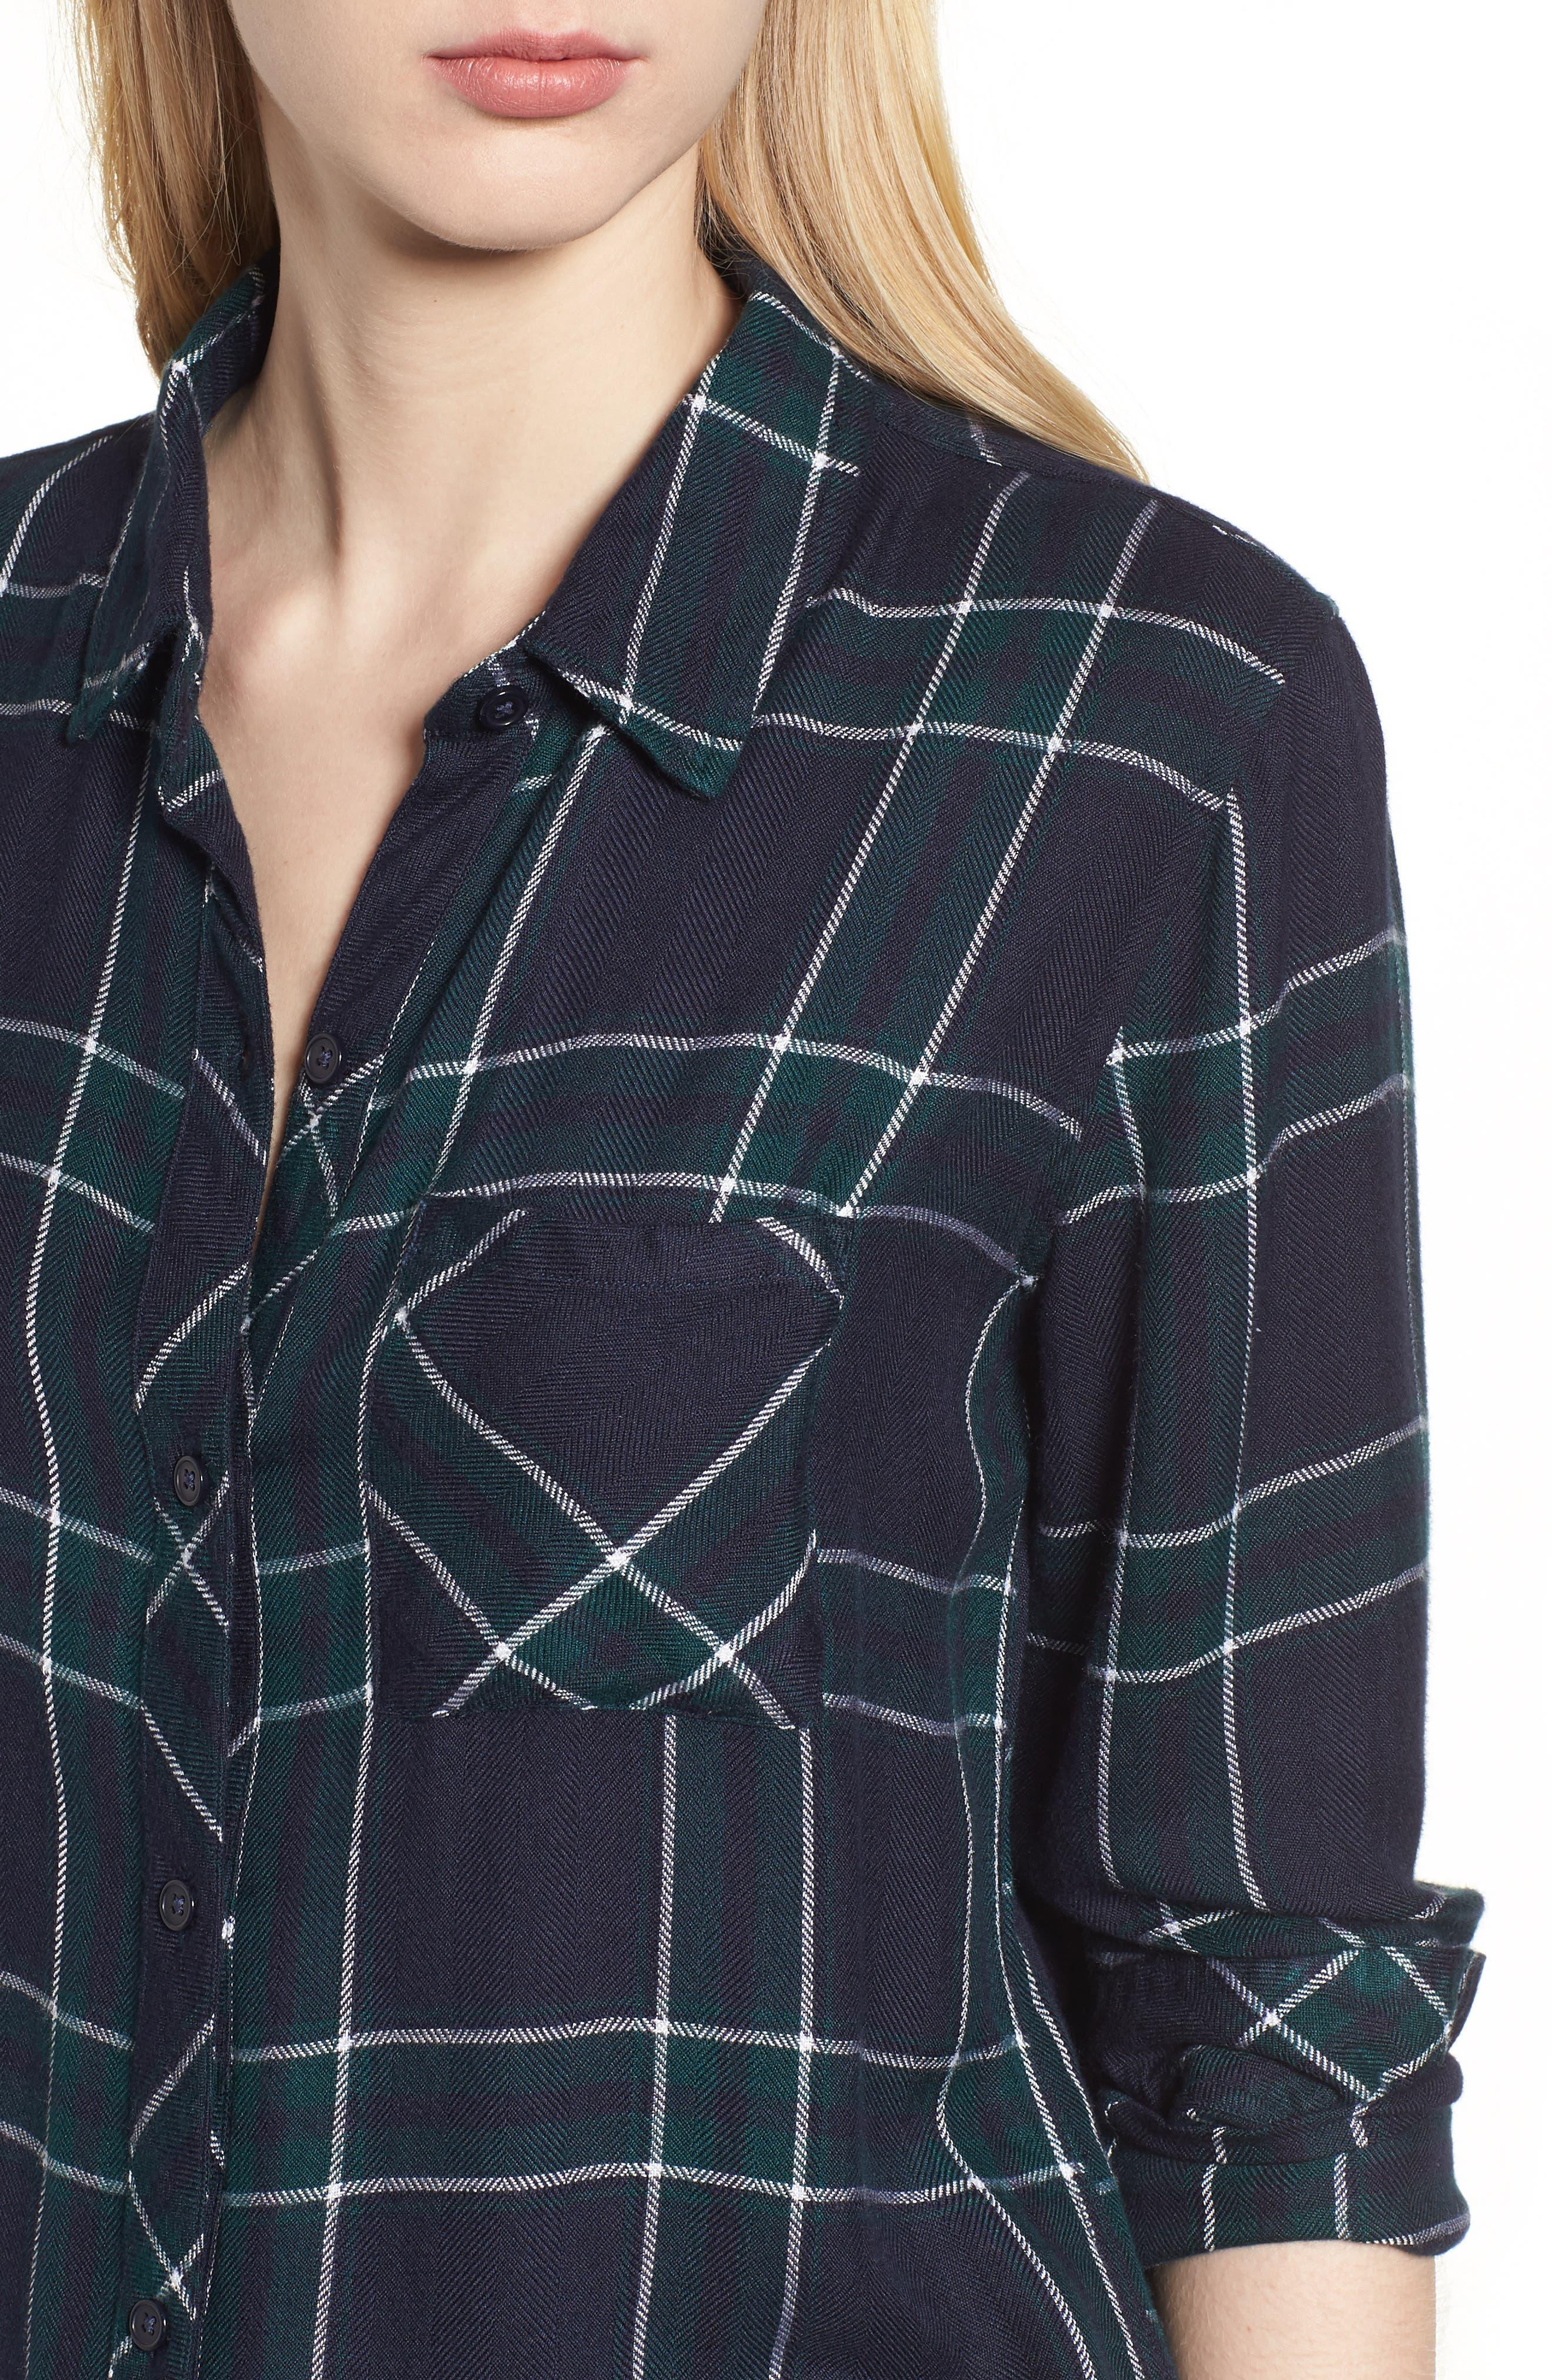 Hunter Plaid Shirt,                             Alternate thumbnail 4, color,                             MIDNIGHT FOREST WHITE